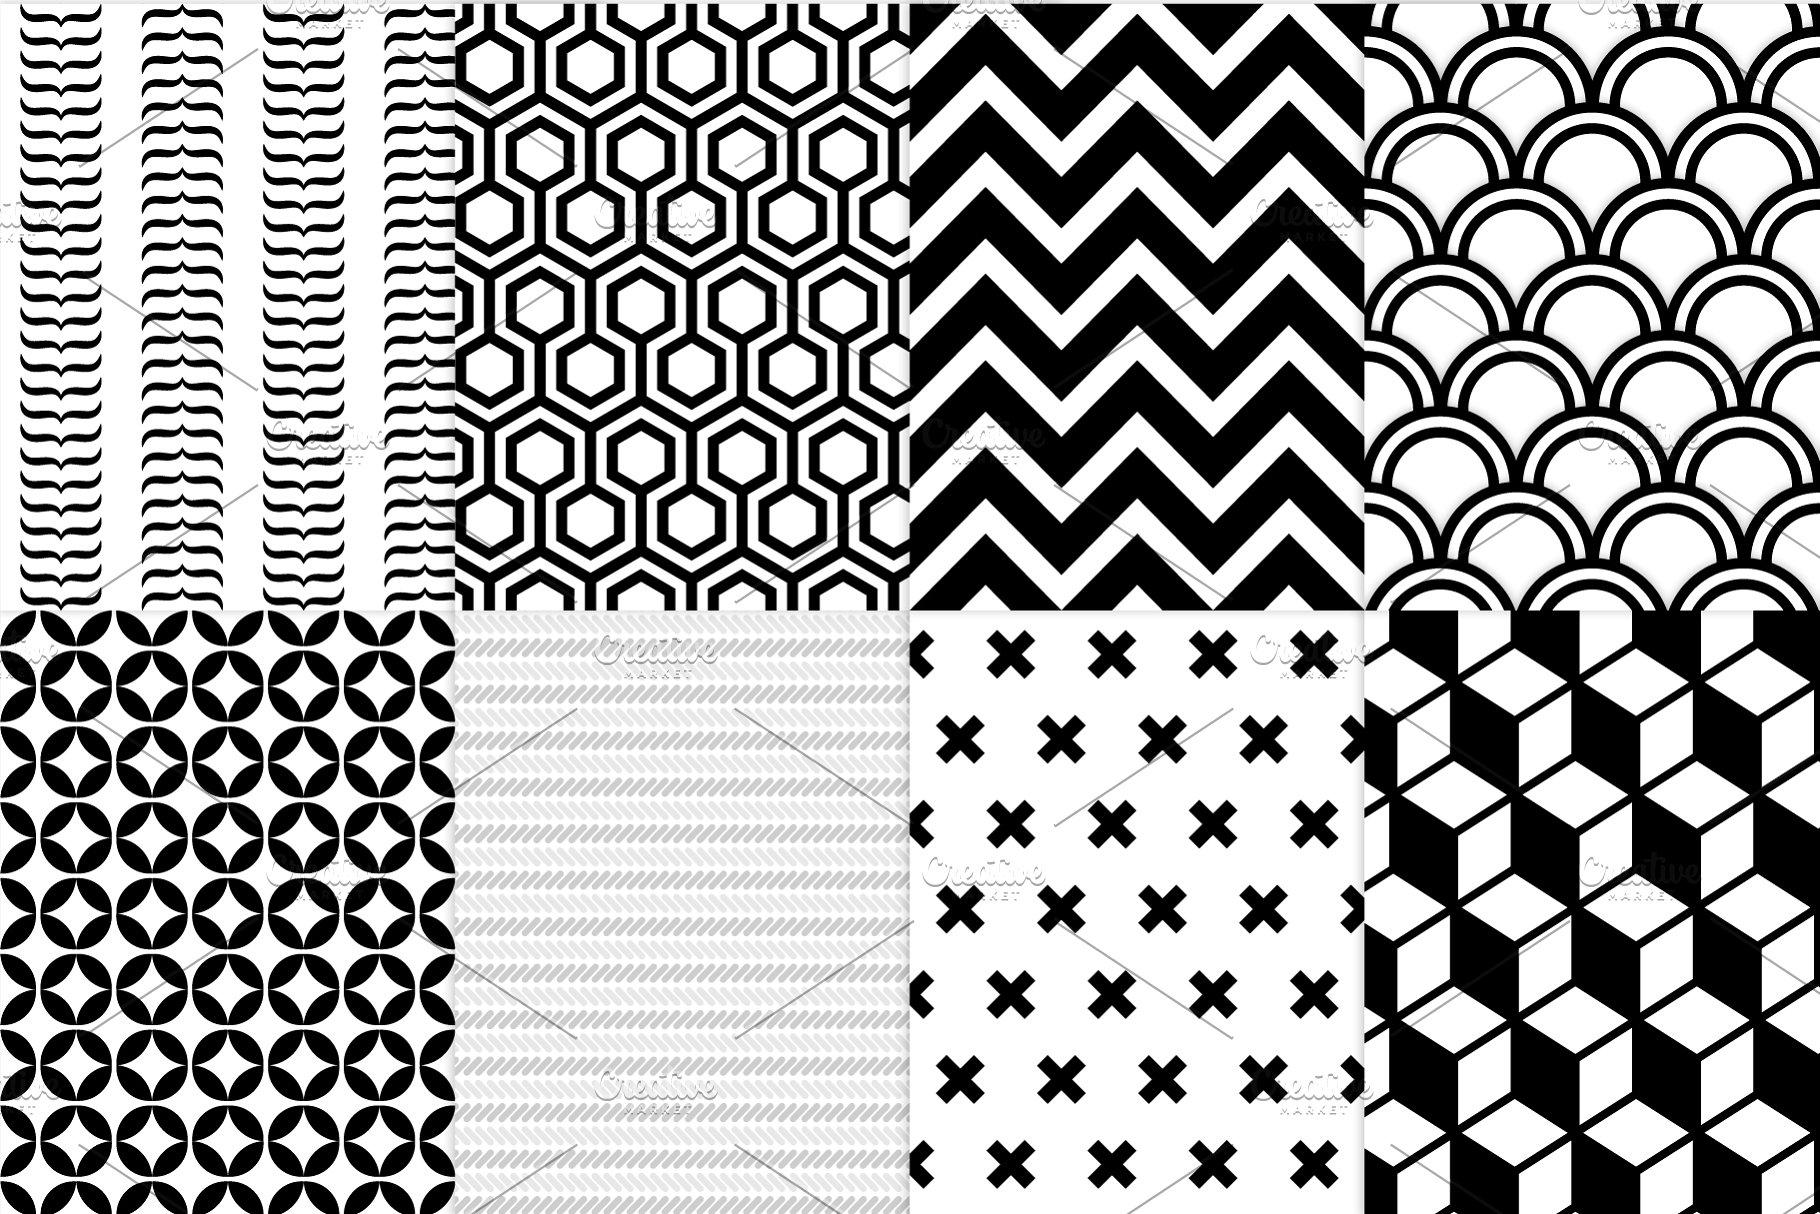 geometric-patterns-bw-shop-sample02-.jpg